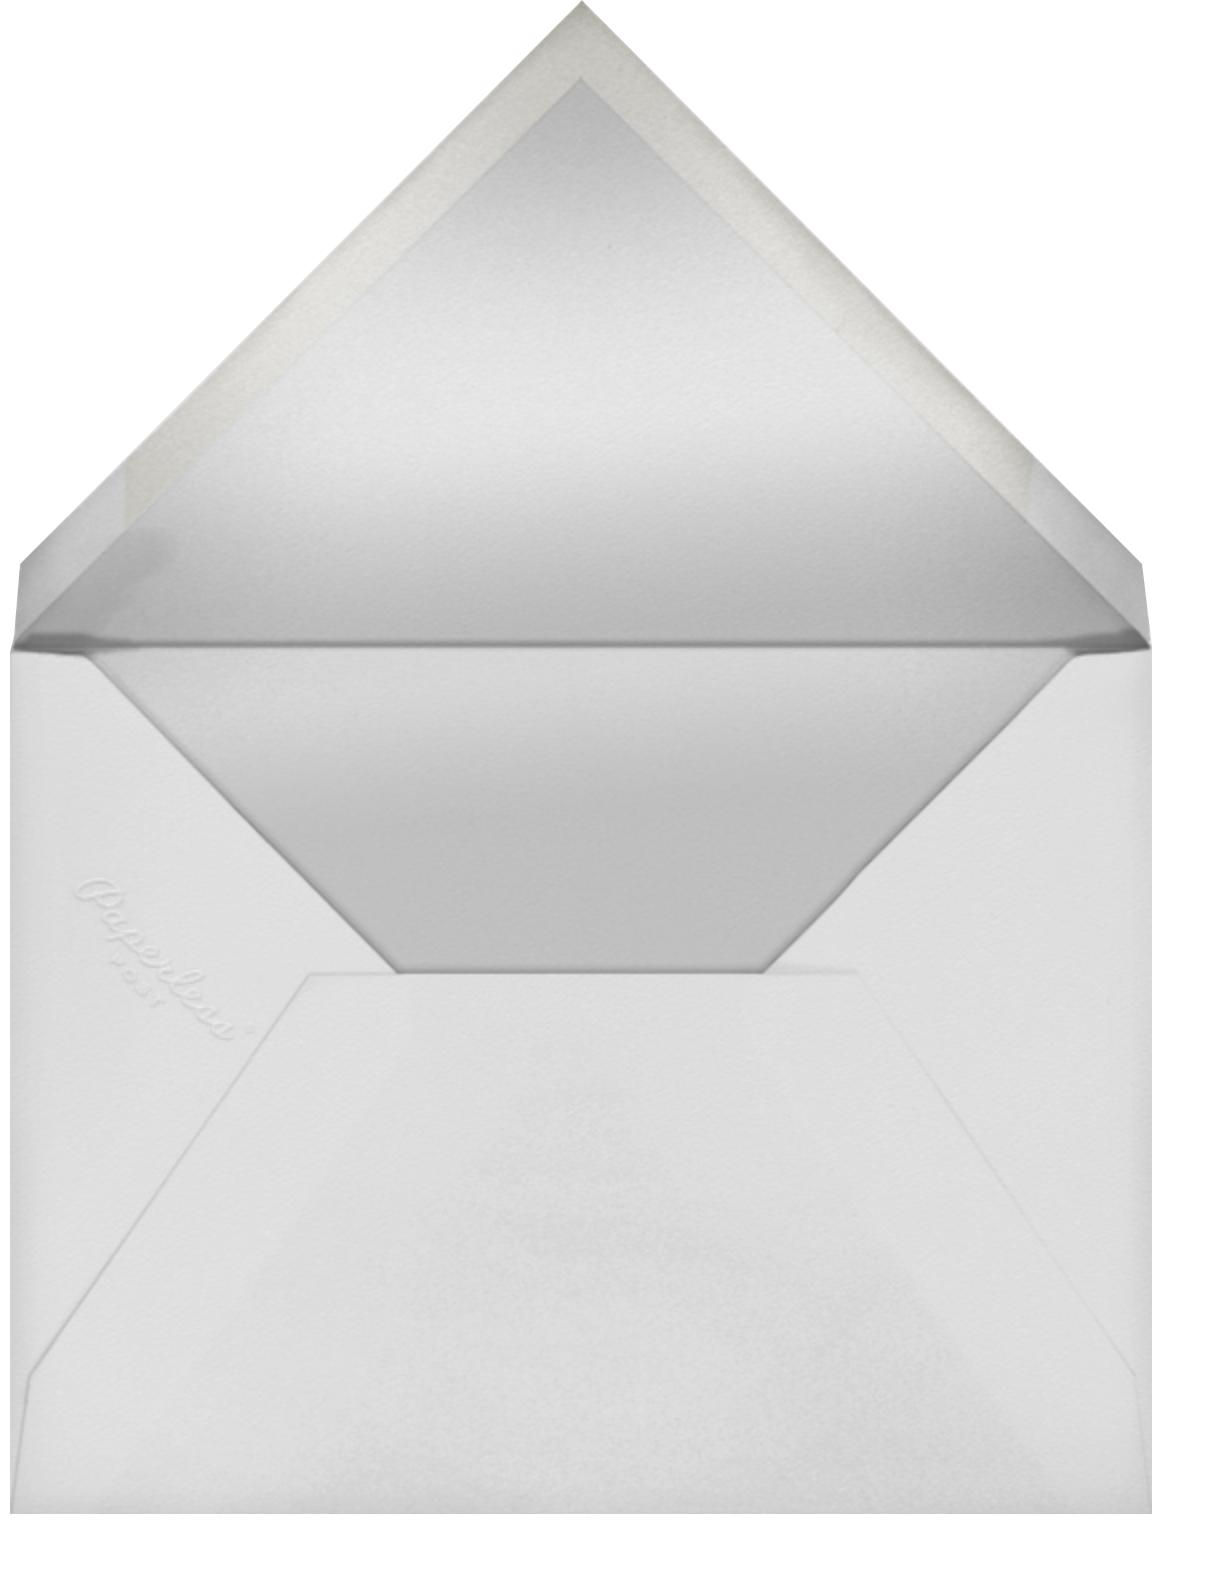 Savoy (Menu) - Emerald - Paperless Post - Menus - envelope back